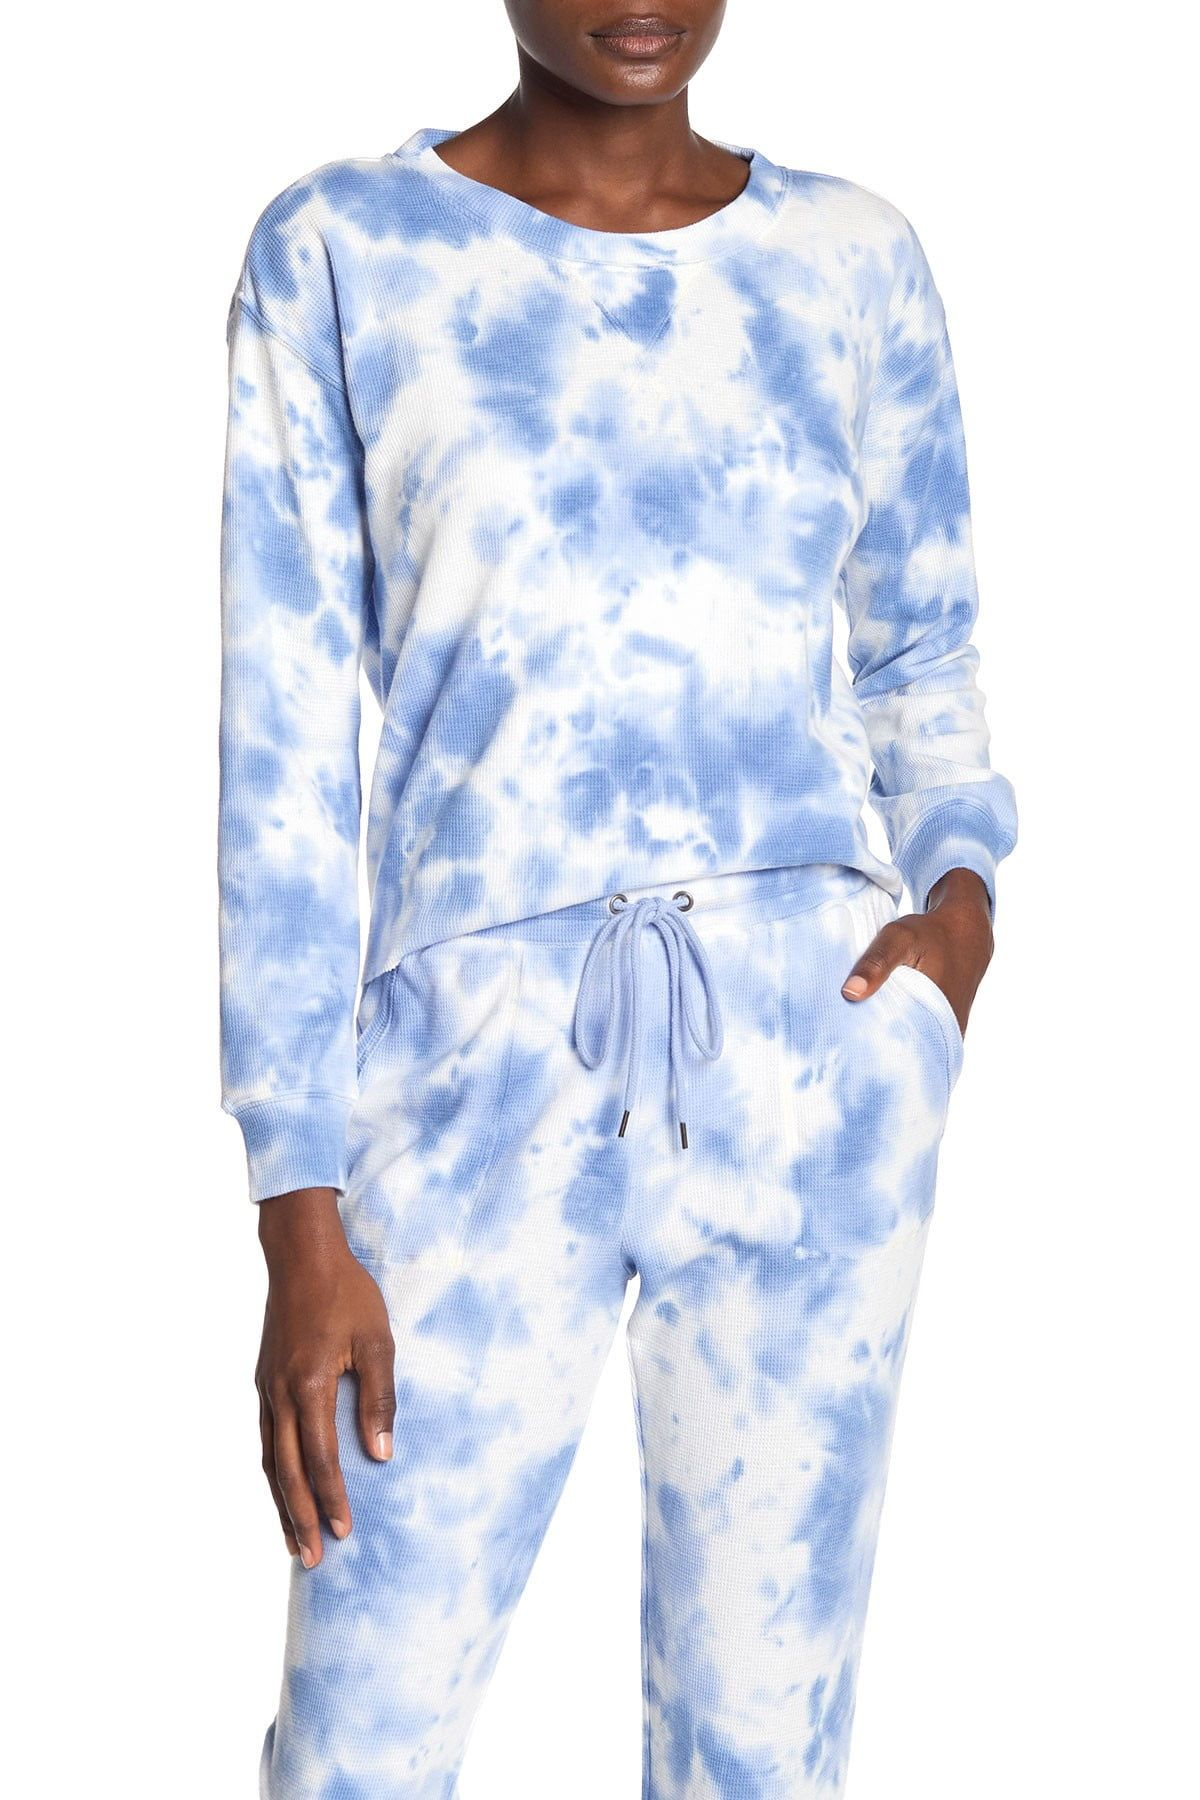 Splendid Tie Dye Sweatshirt Nordstrom Rack In 2021 Tie Dye Shirts Tie Dye Sweatshirt Lounge Wear [ 1800 x 1200 Pixel ]